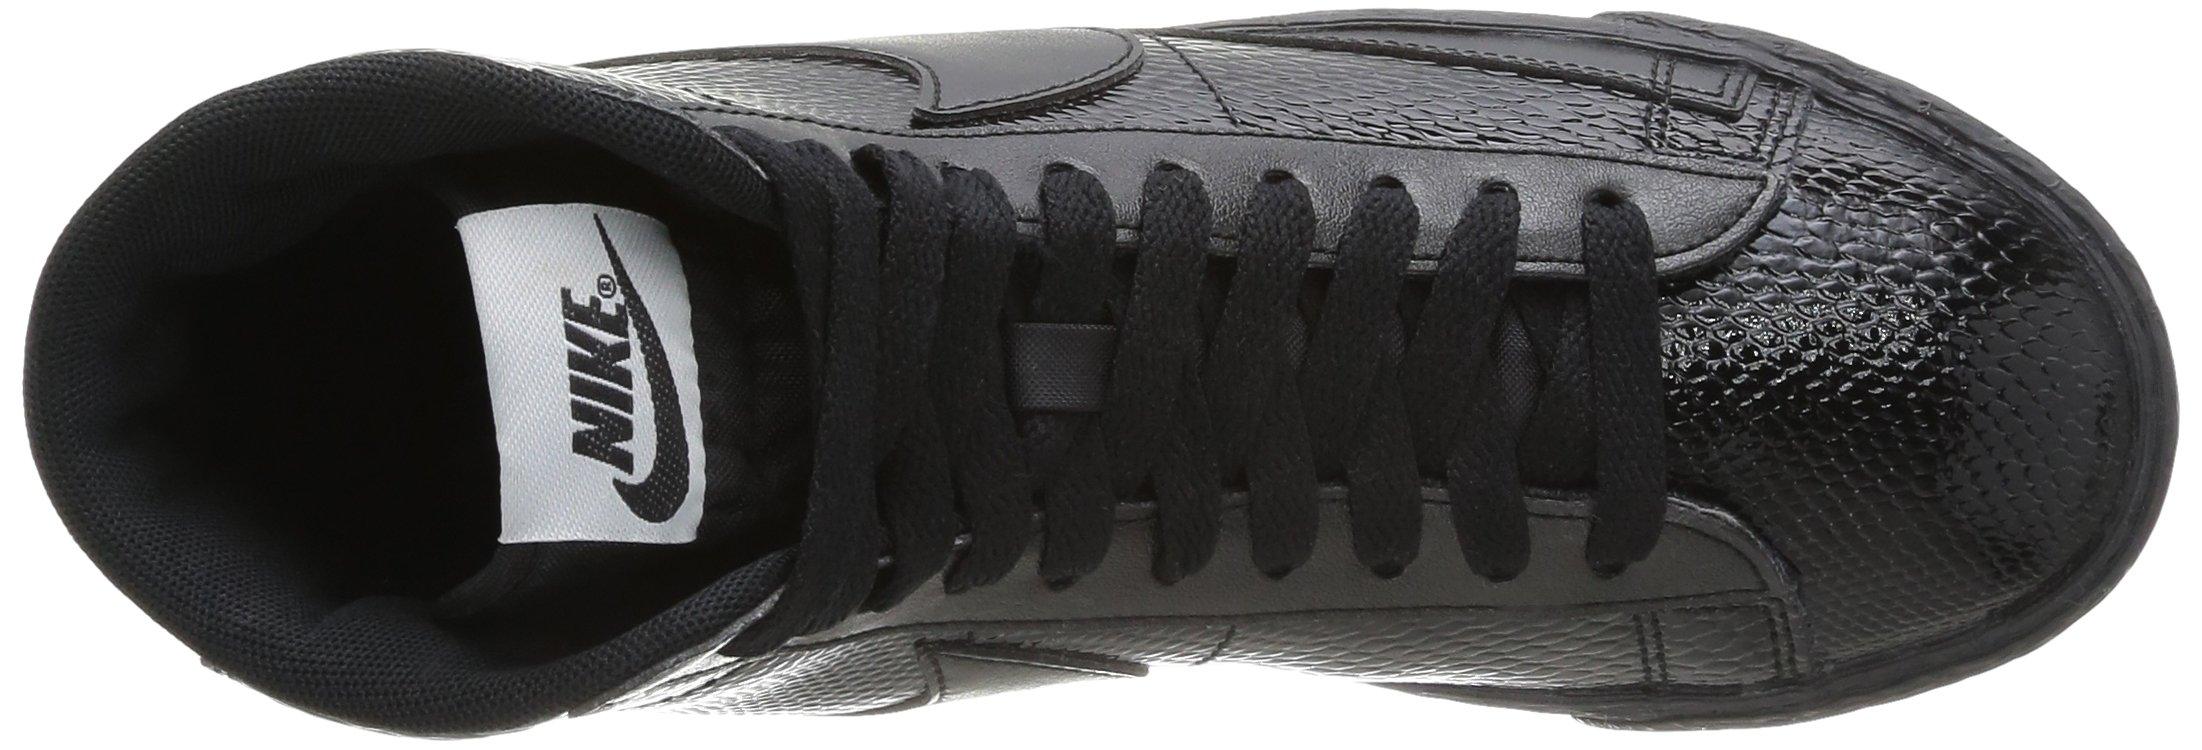 Nike Women's Blazer MID LTR PRM Black 685225-001 (SIZE: 8) by NIKE (Image #7)